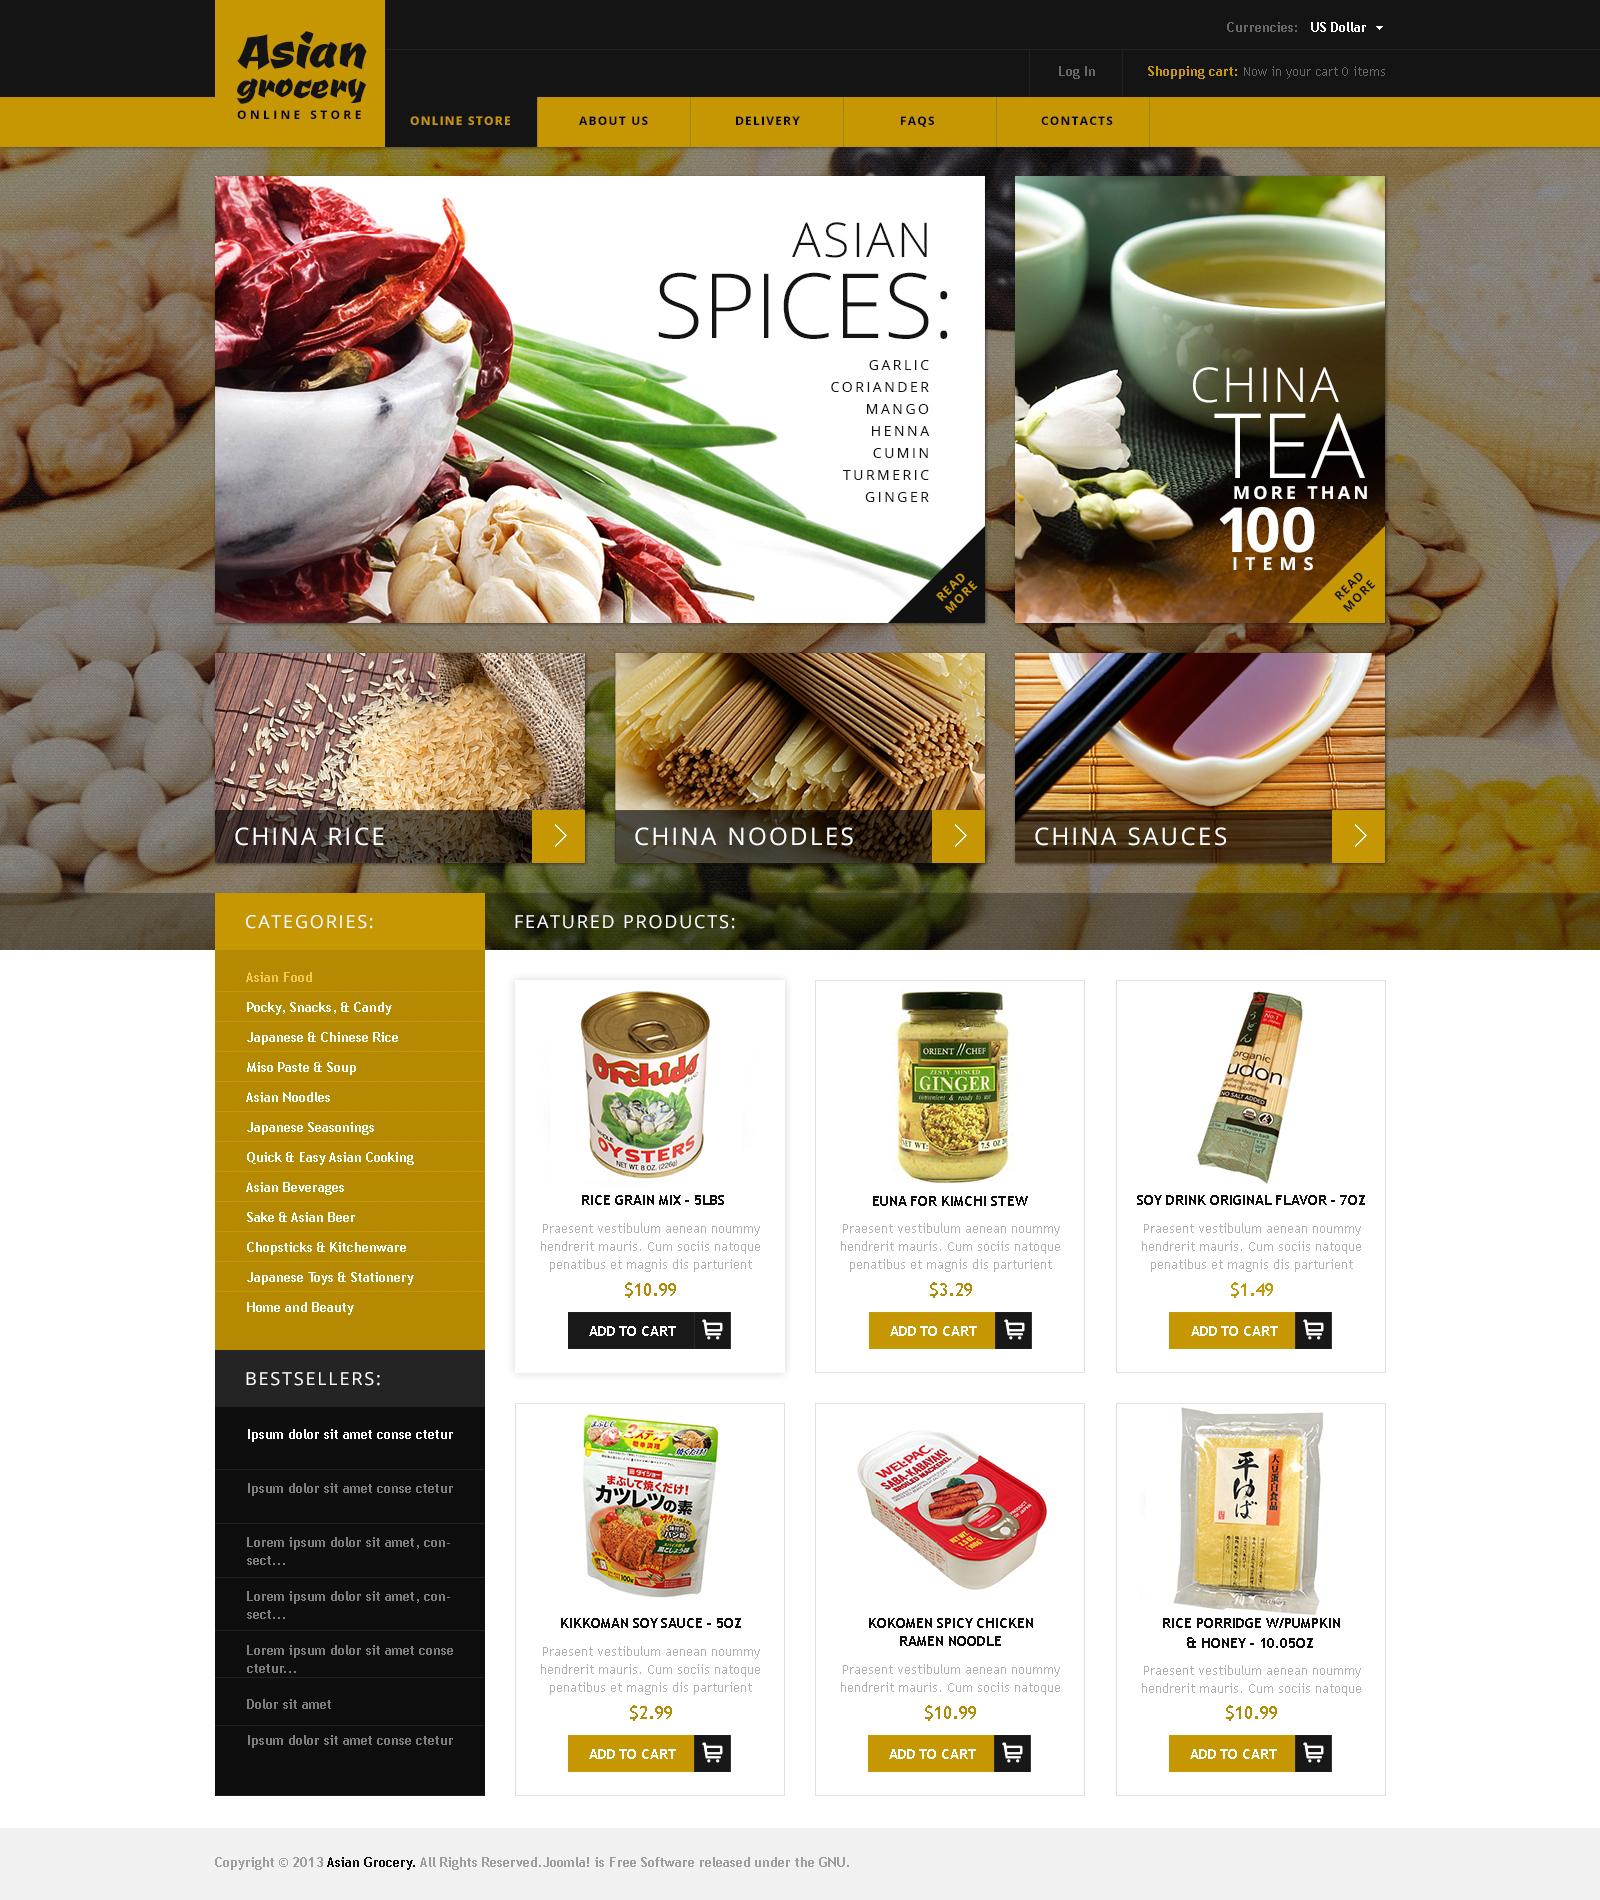 Asian Grocery №46736 - скриншот